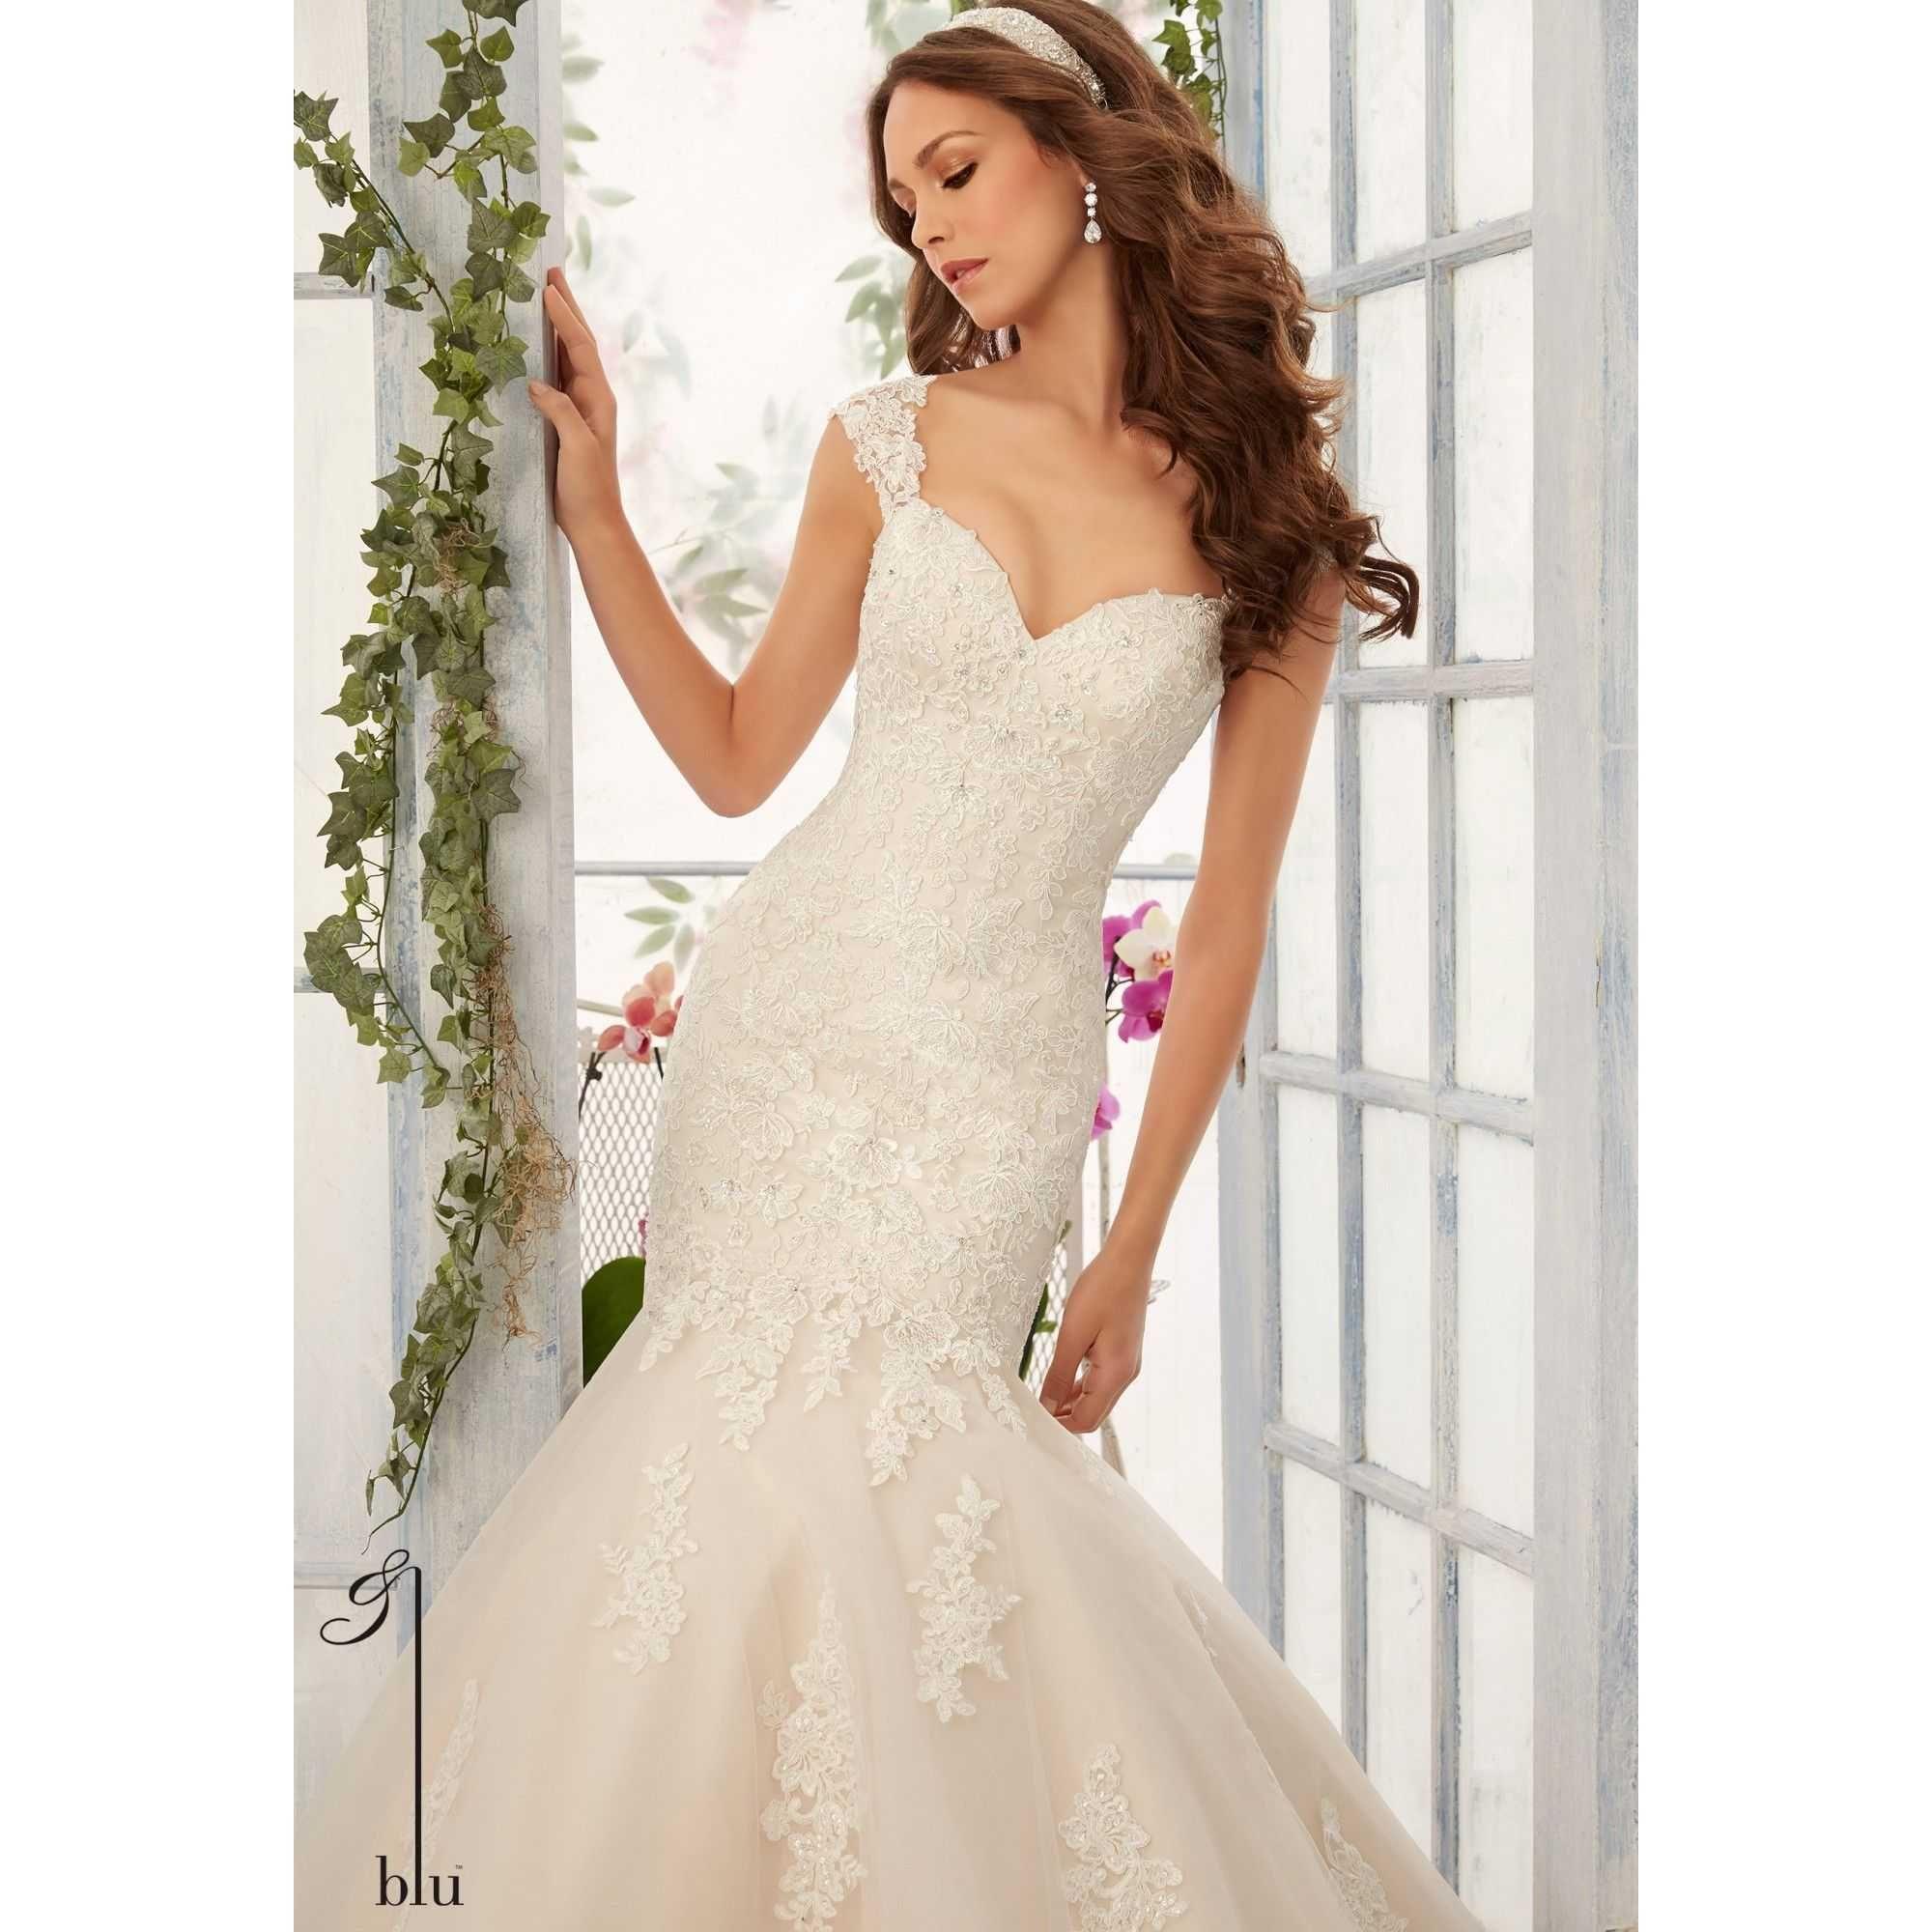 Wedding dresses stores  Unique Wedding Dresses Stores In Austin Tx  wedding dresses